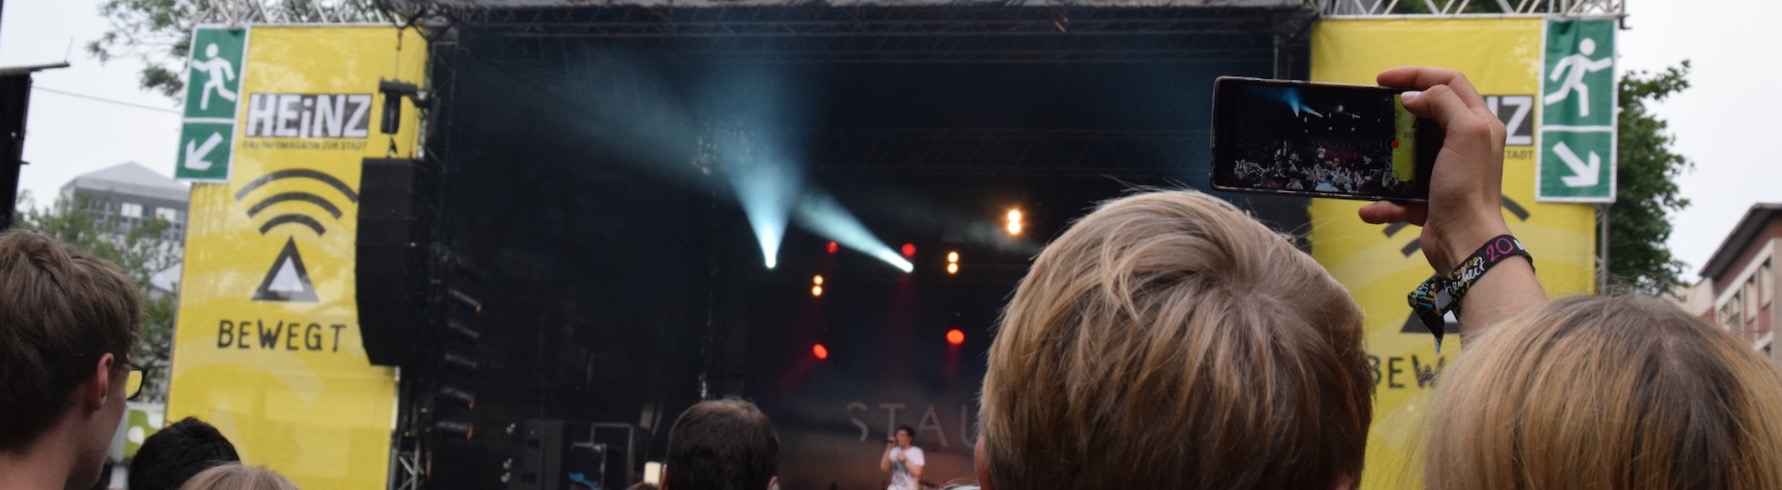 Staubkind-Konzert bei Bochum Total. ©mhu